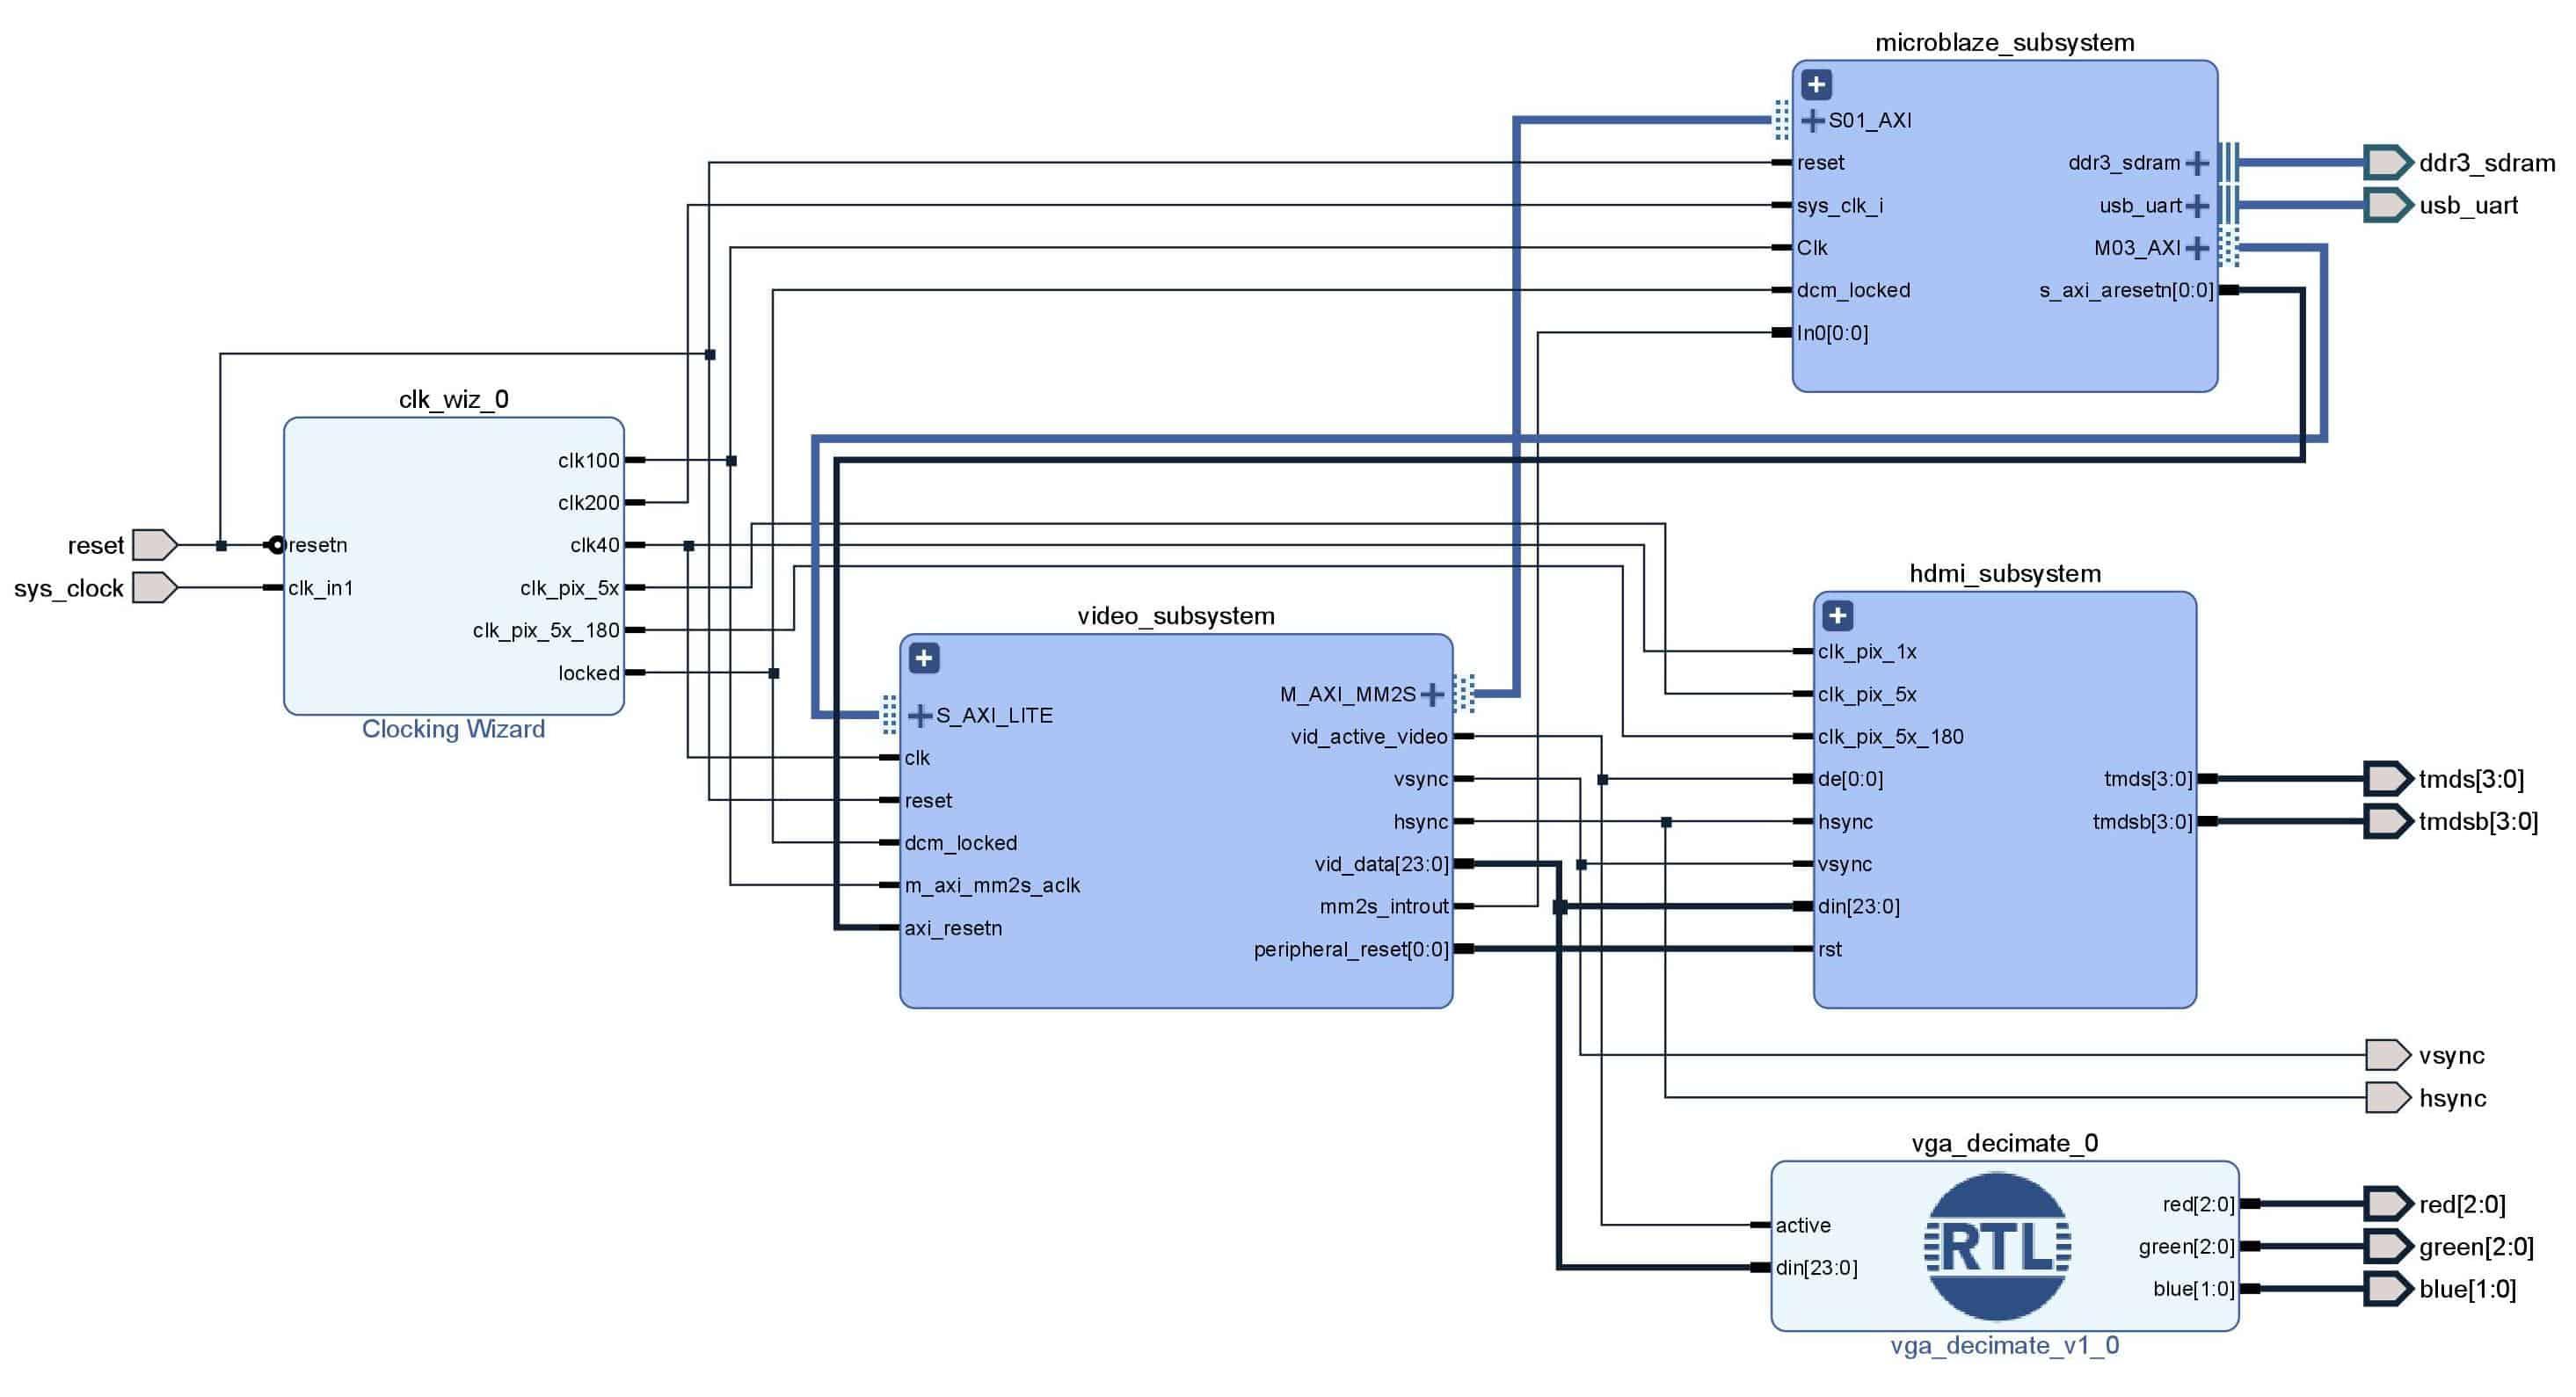 xbox surround sound hookup diagram 15 14 combatarms game de \u2022xbox network diagram wiring schematic diagram rh 55 twizer co hdmi surround sound systems wiring diagram sony surround sound 5 1 and hdtv hook up